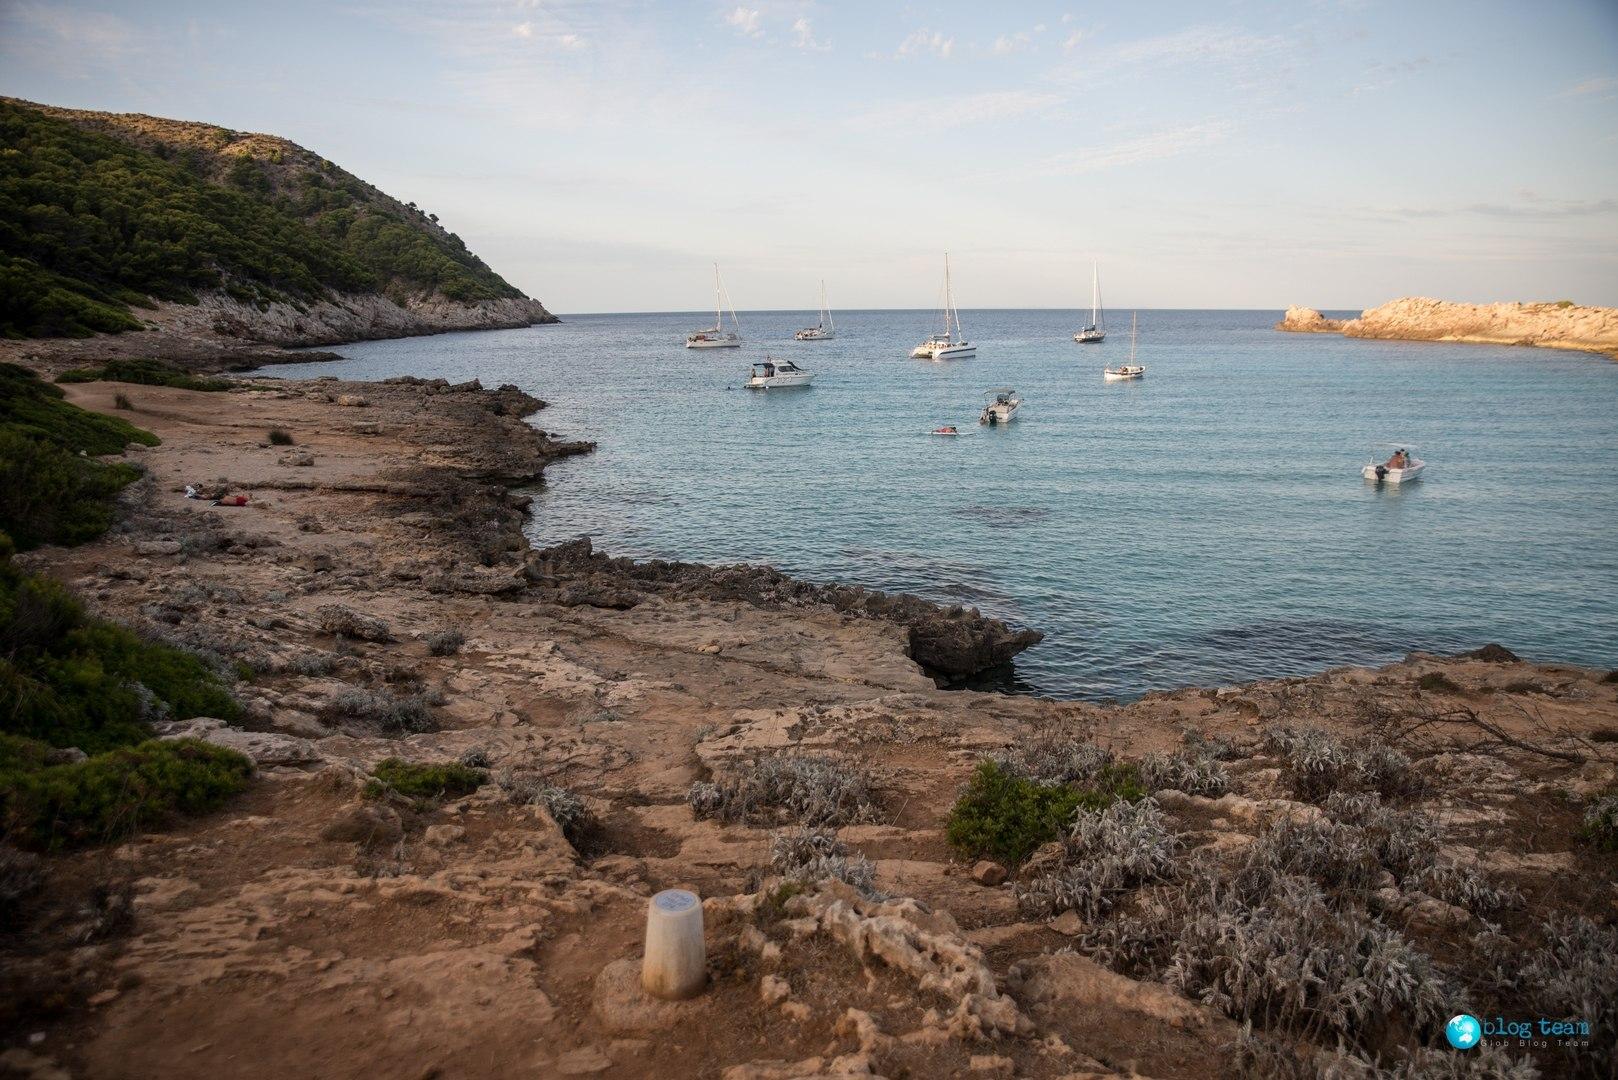 Spanie na dziko na Majorce, okolice Cala Agulla